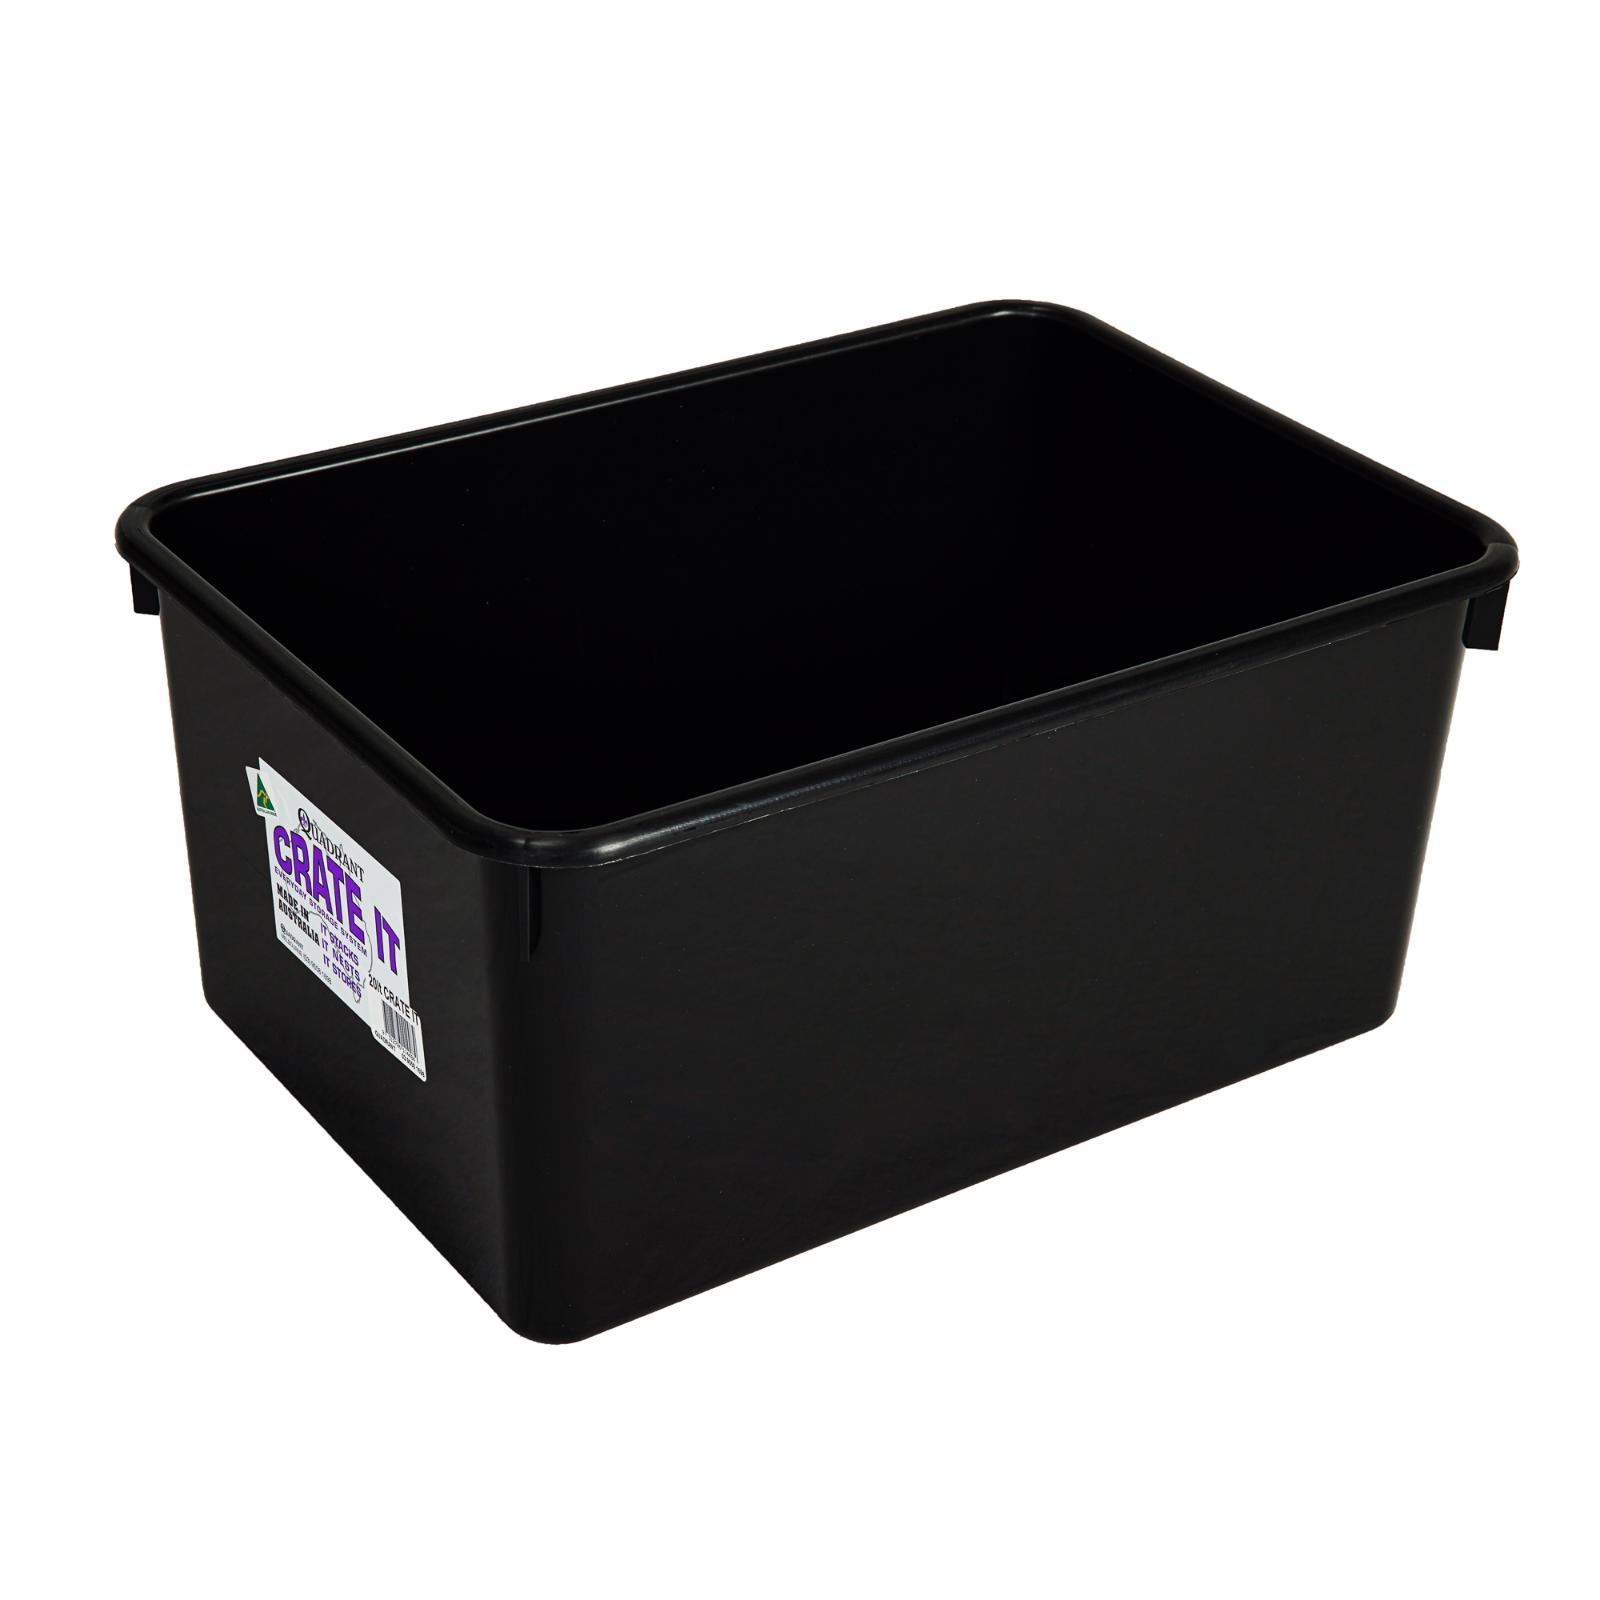 2x Large Heavy Duty 20L Black Plastic Basin Tub Containers Storage Crates Box AU